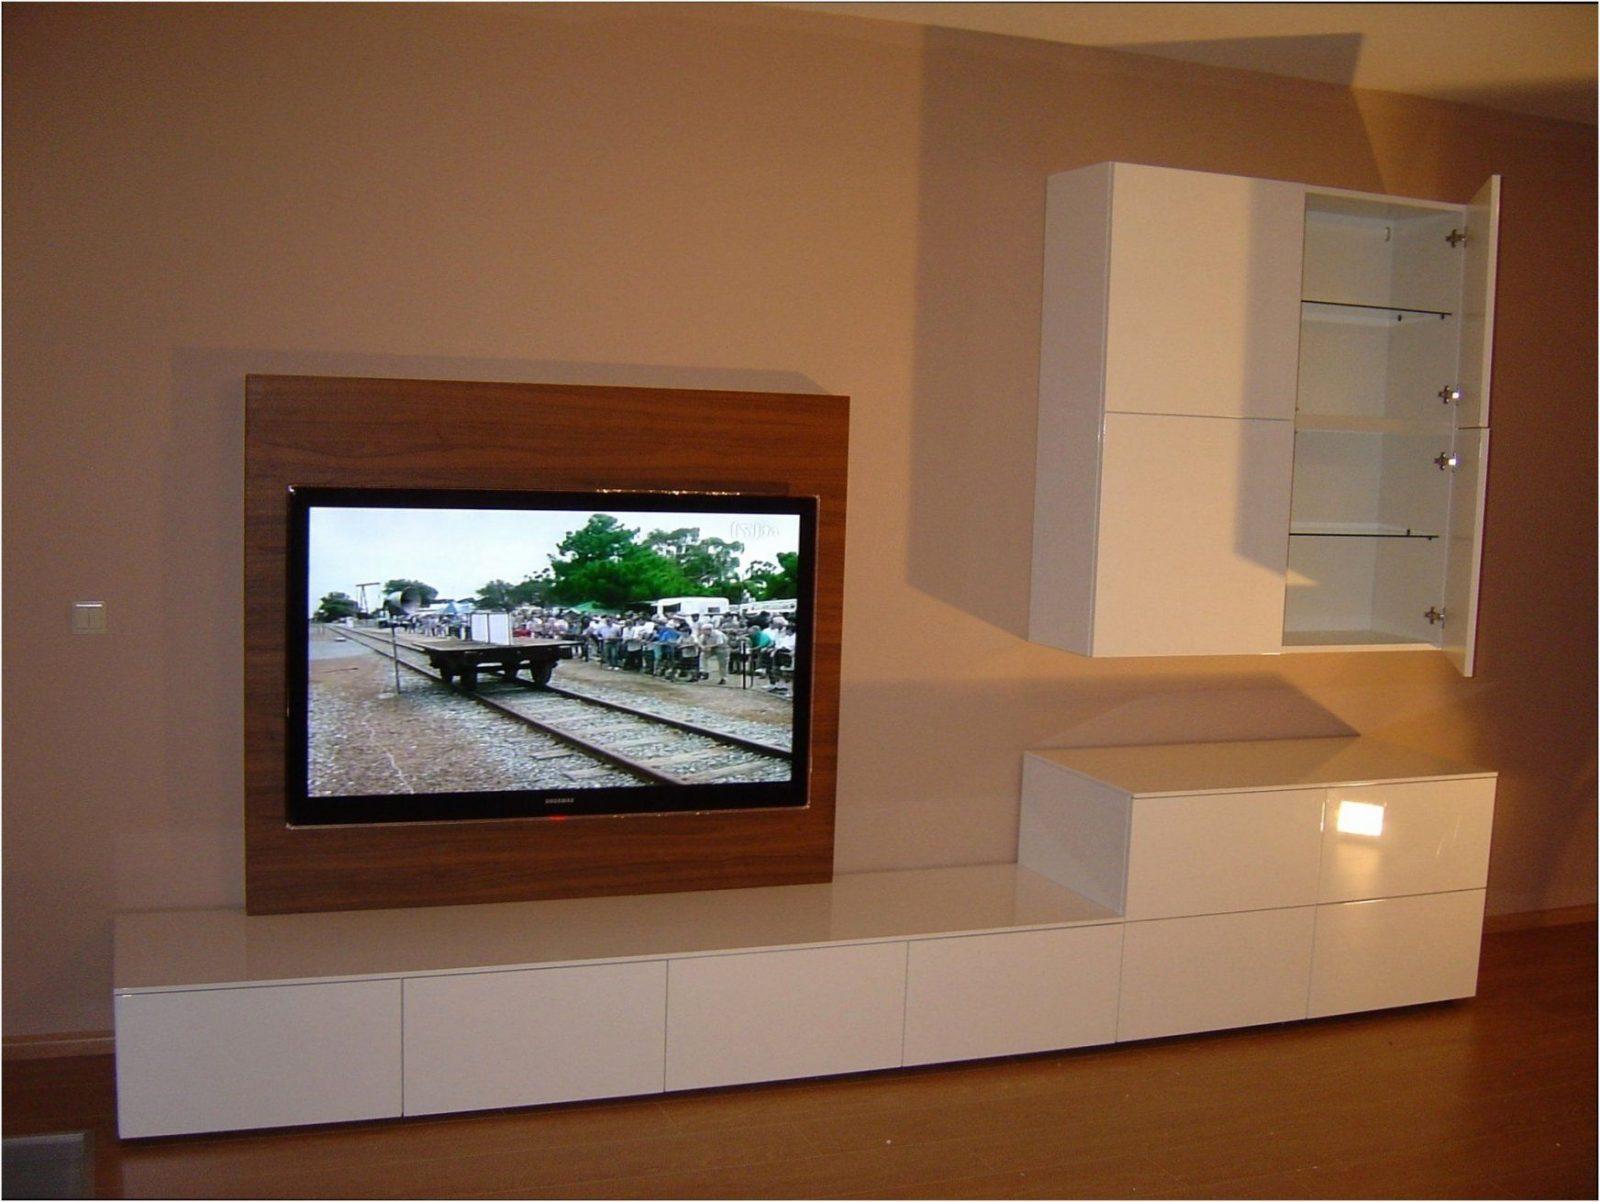 tv wand selber bauen ideen und auch genial mobel akzent tgdarkly von tv wand selber bauen ideen. Black Bedroom Furniture Sets. Home Design Ideas